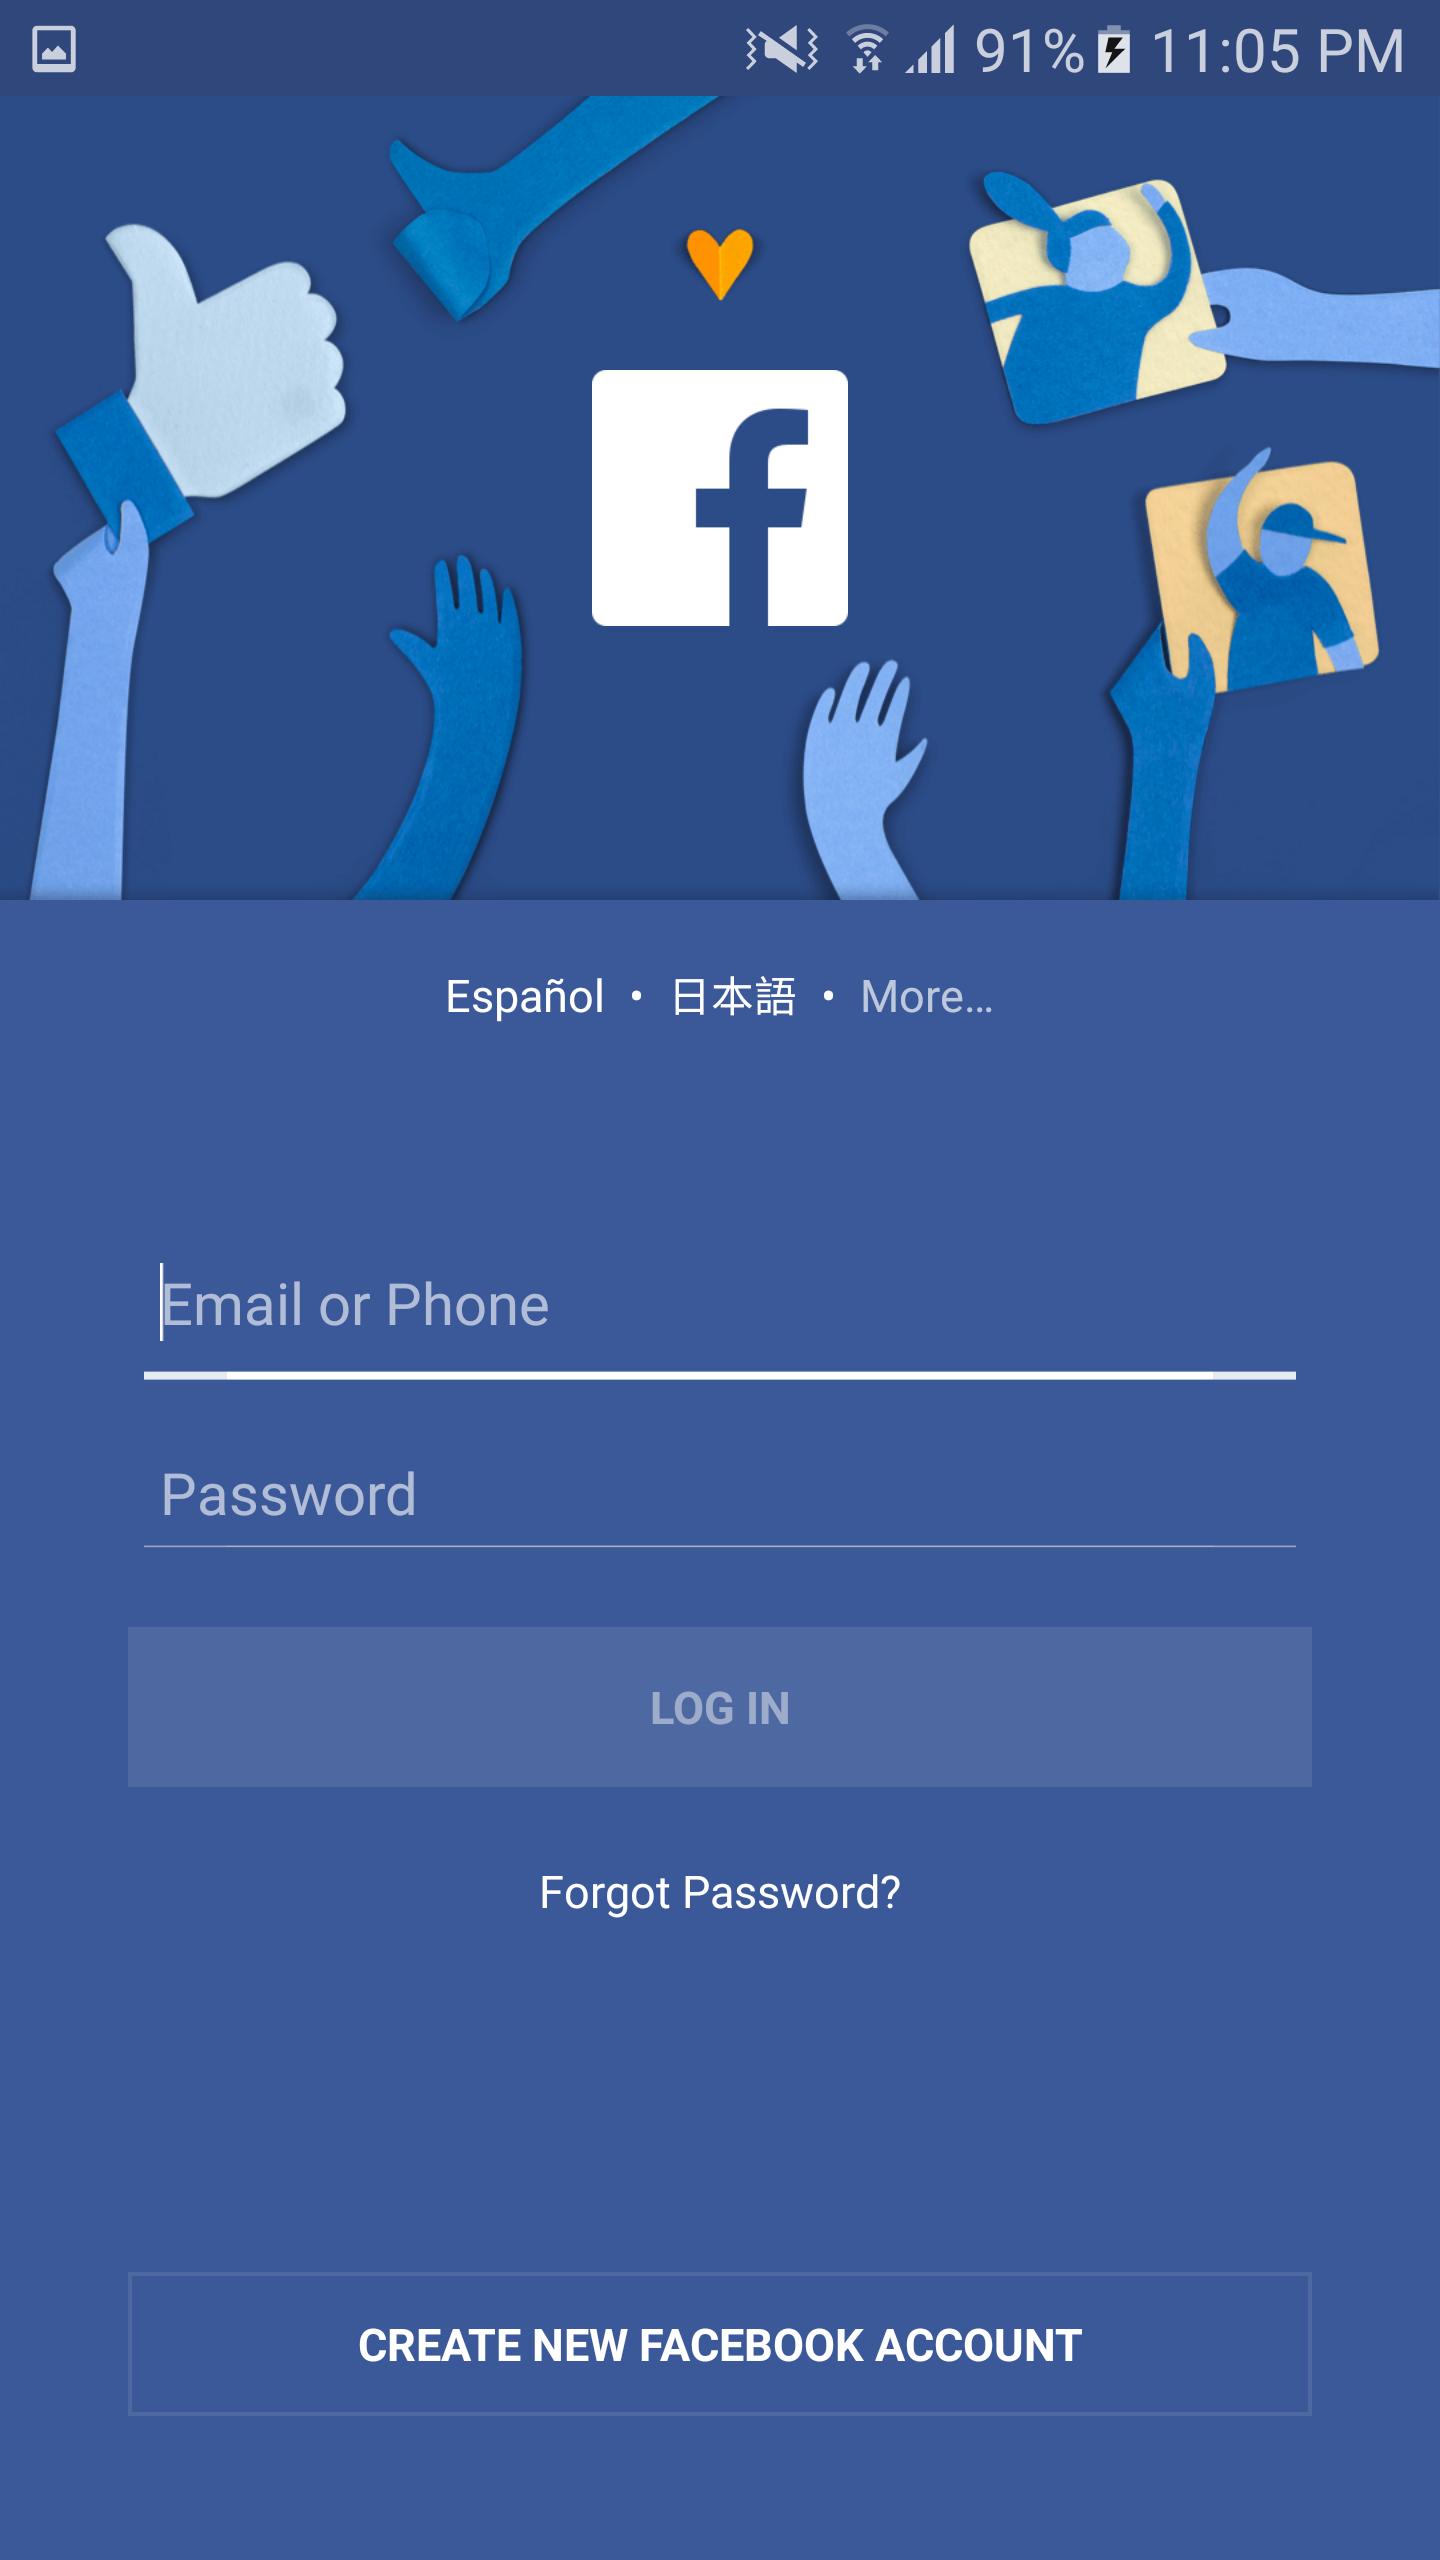 Facebook Login Sign Up New Account Login